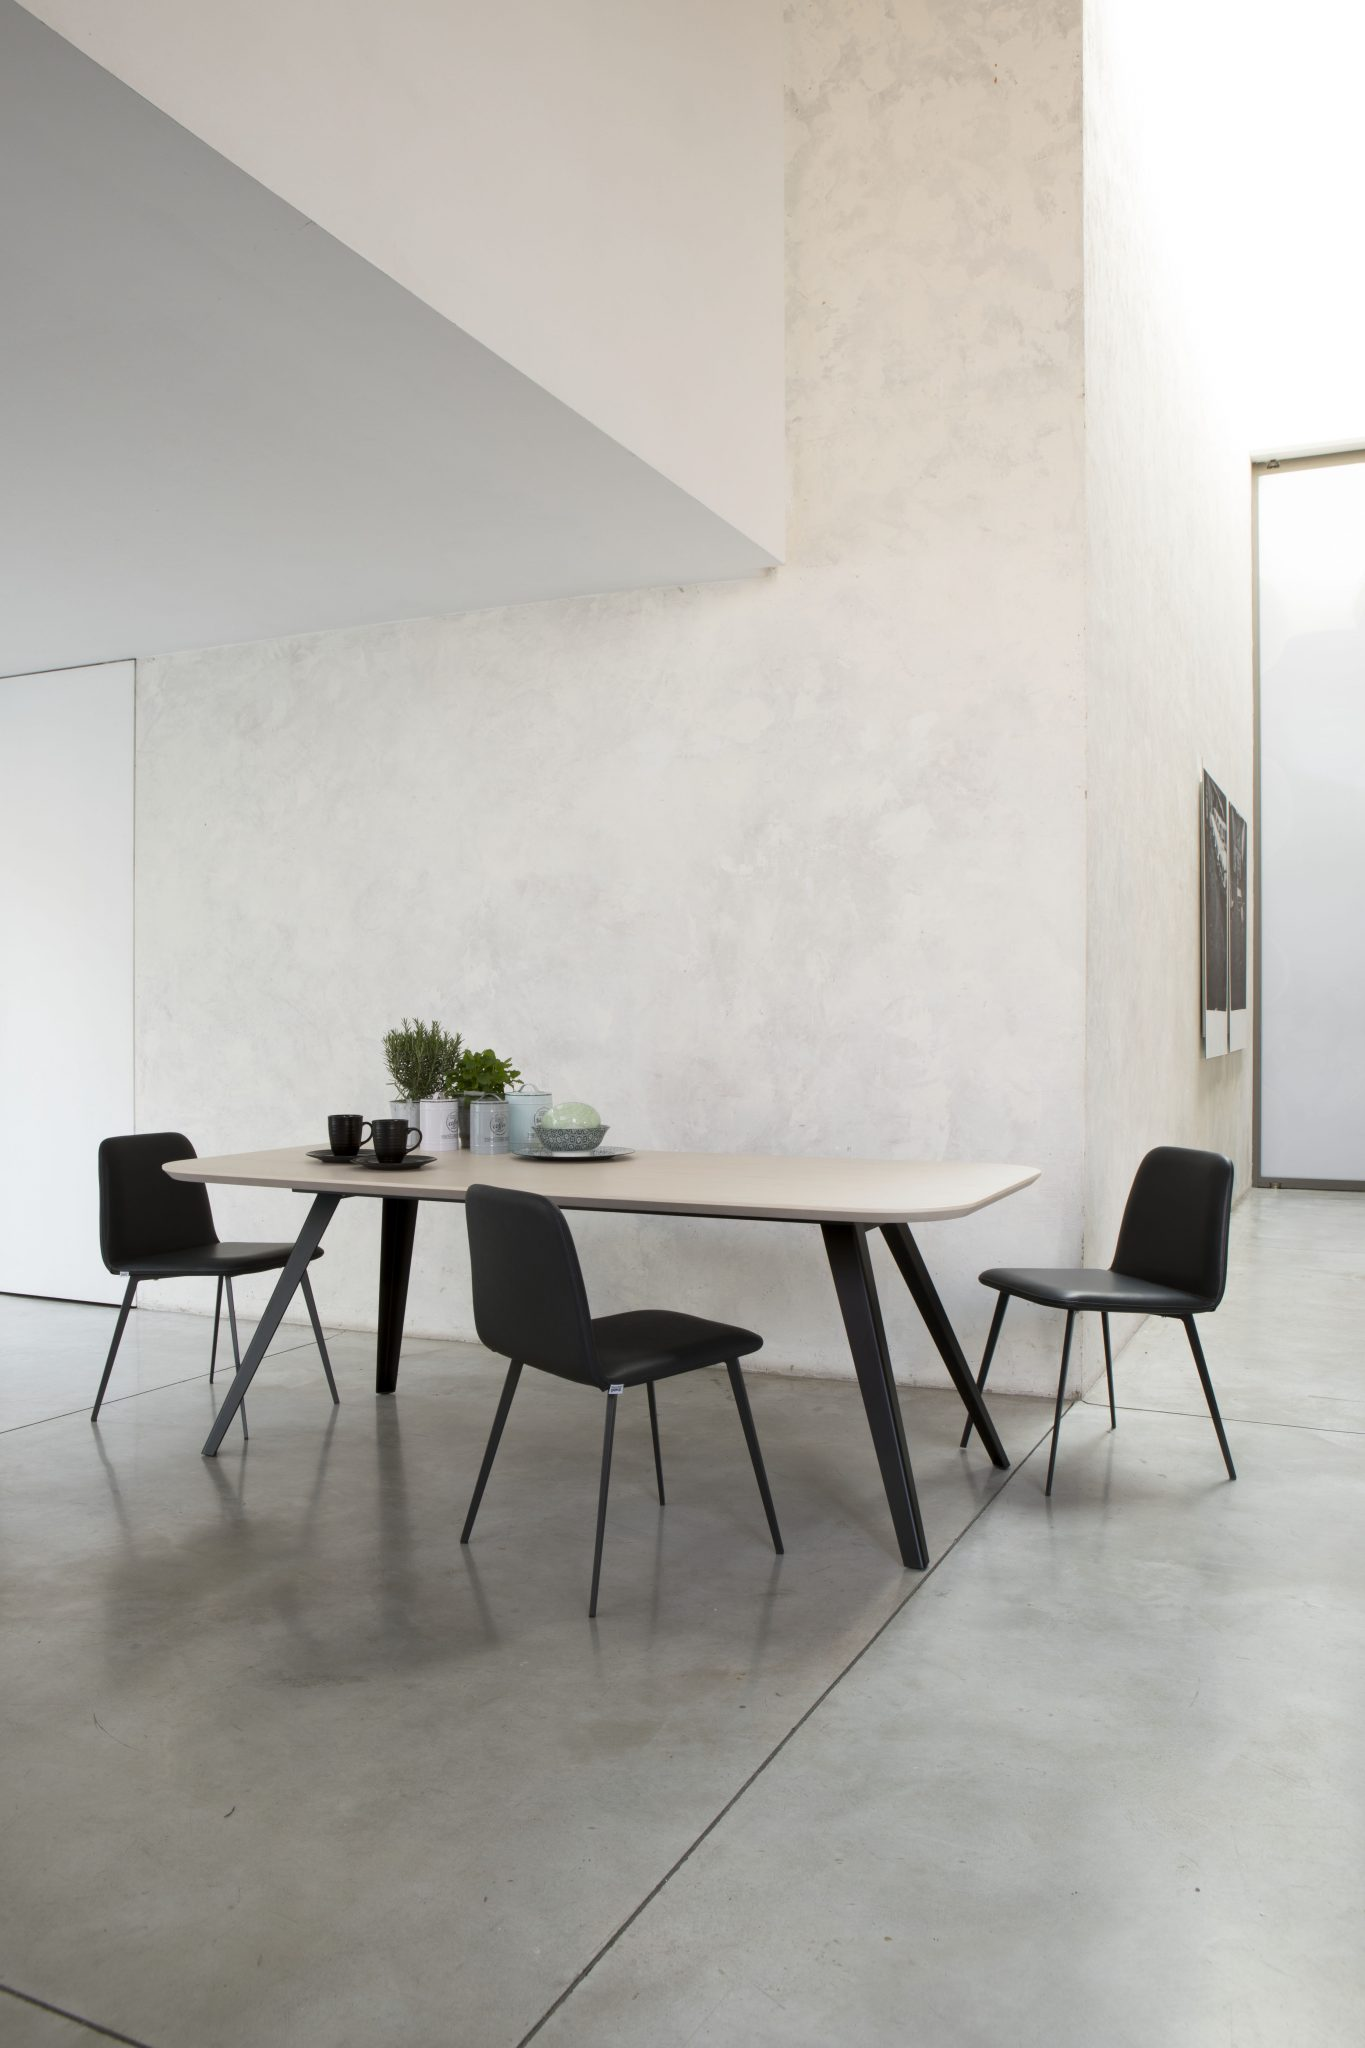 TABLE AKY + BARDOT MET SHOVEL